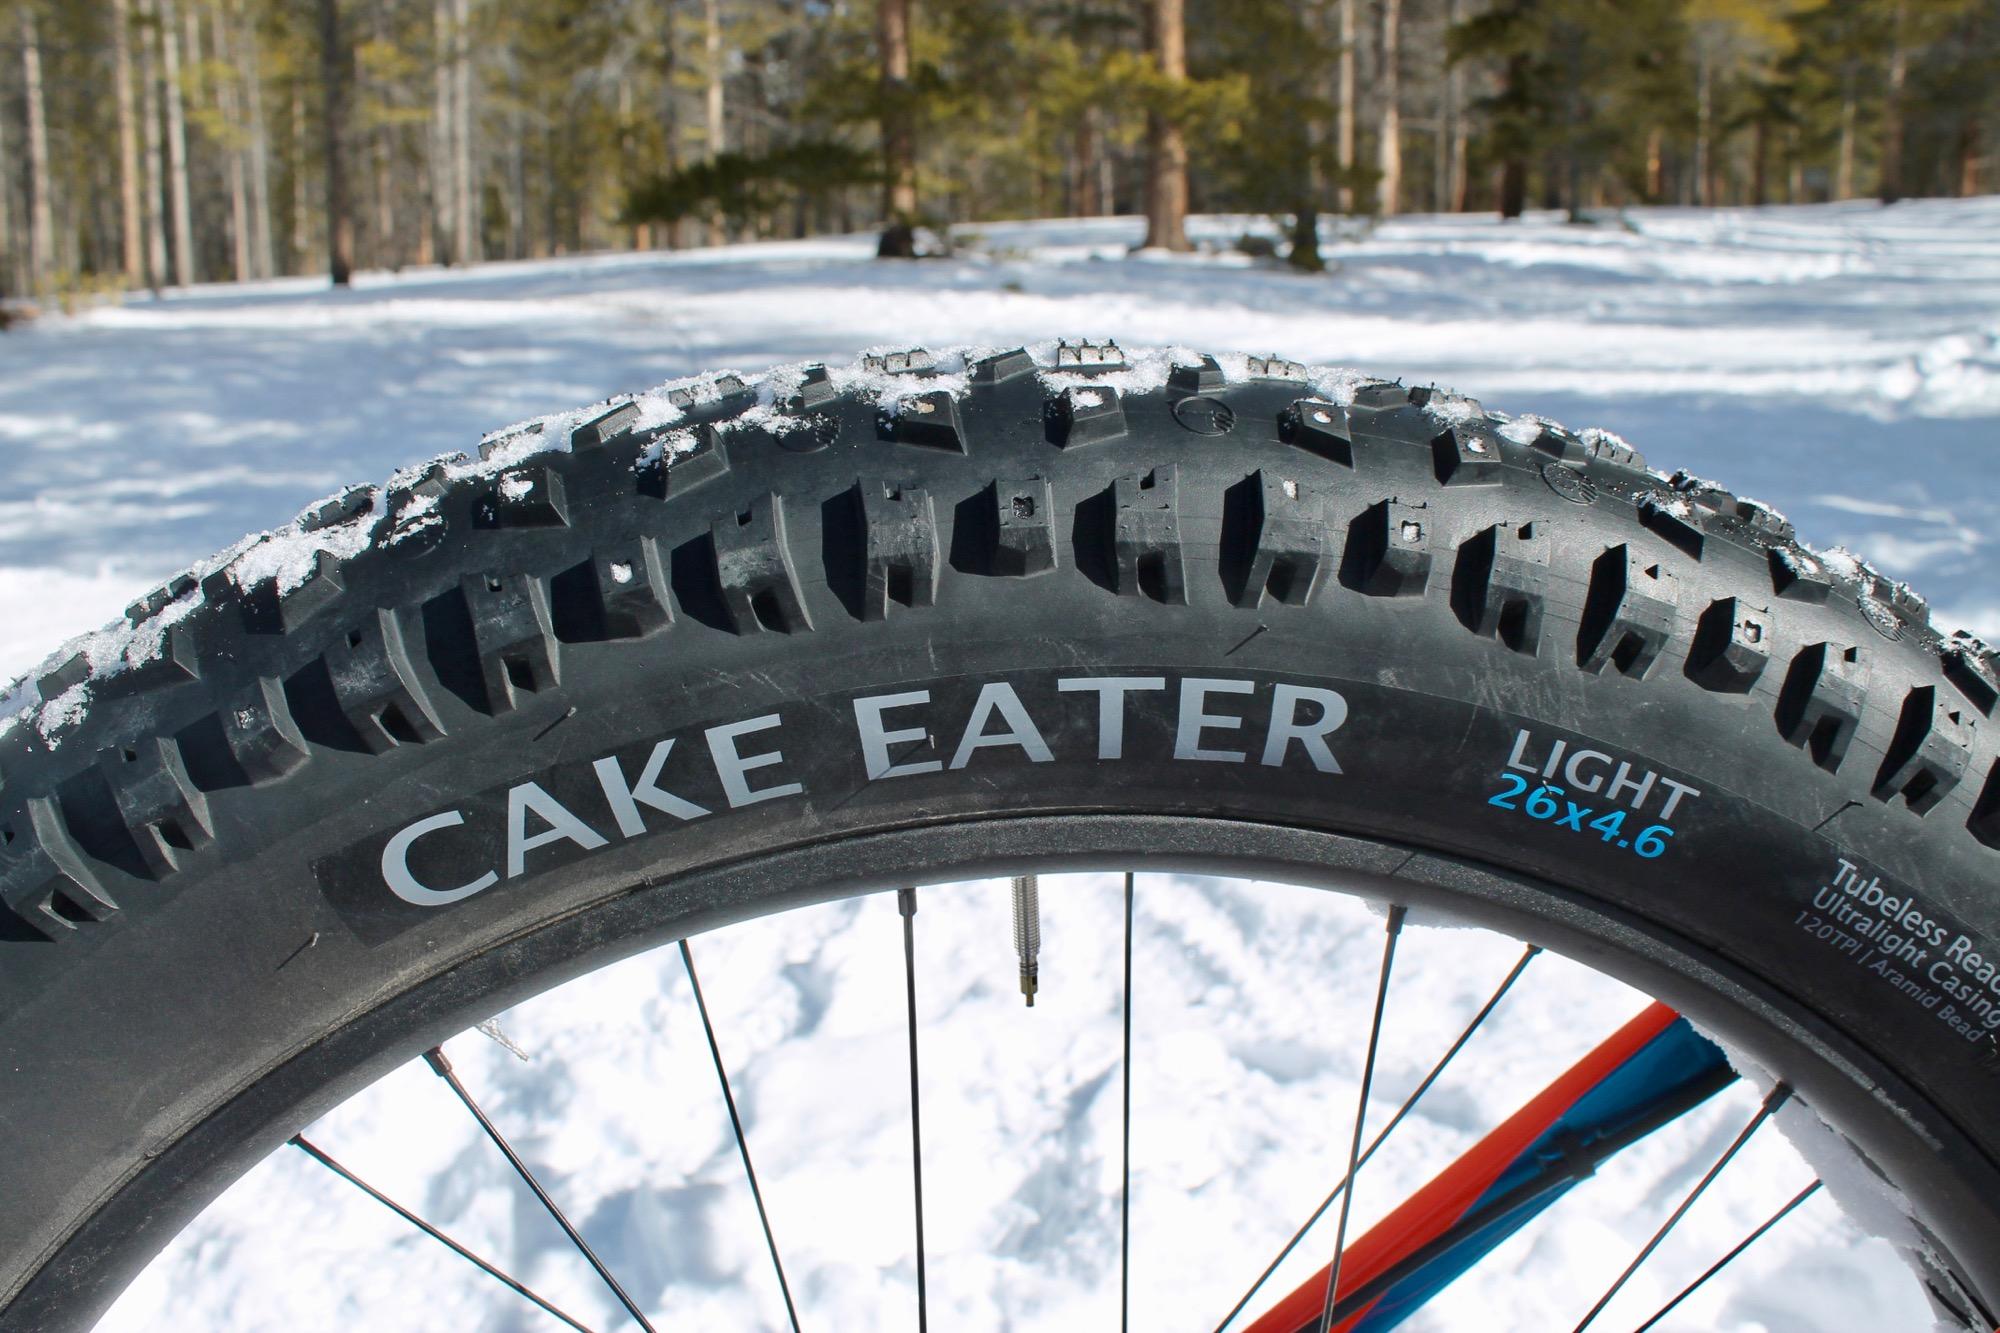 Terrene Cake Eater Light Stud 26x4.6 Fatbike Spike Reifen